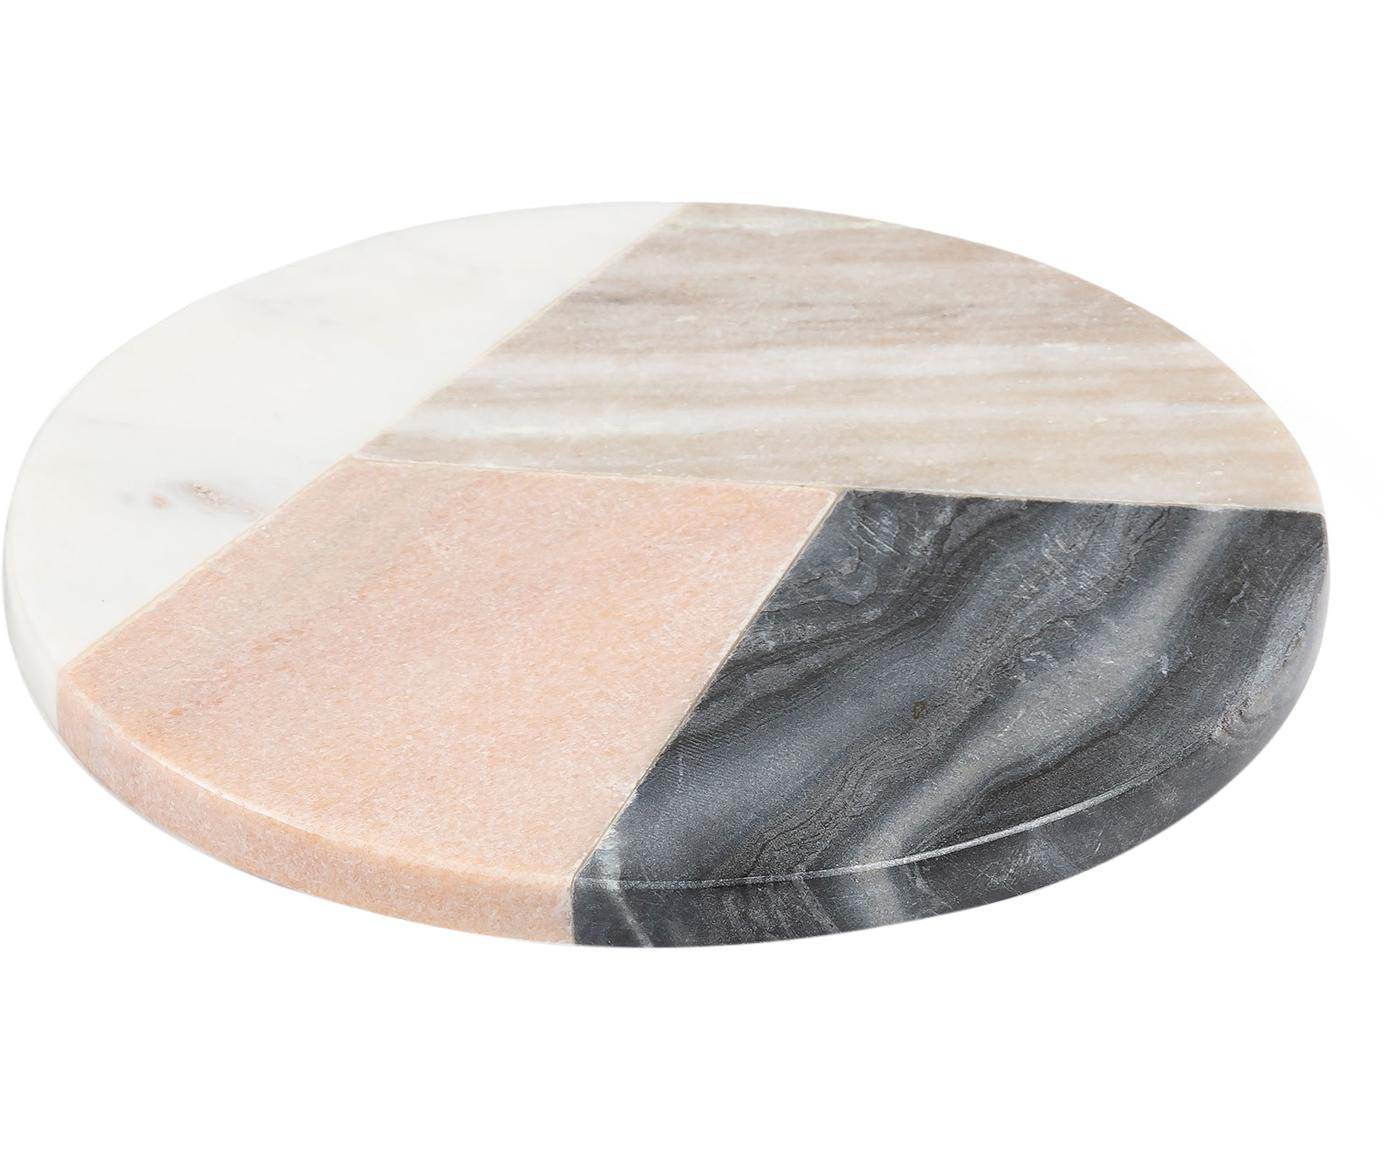 Marmeren serveerplank Bradney, Keramiek, marmer, Multicolour, Ø 20 cm